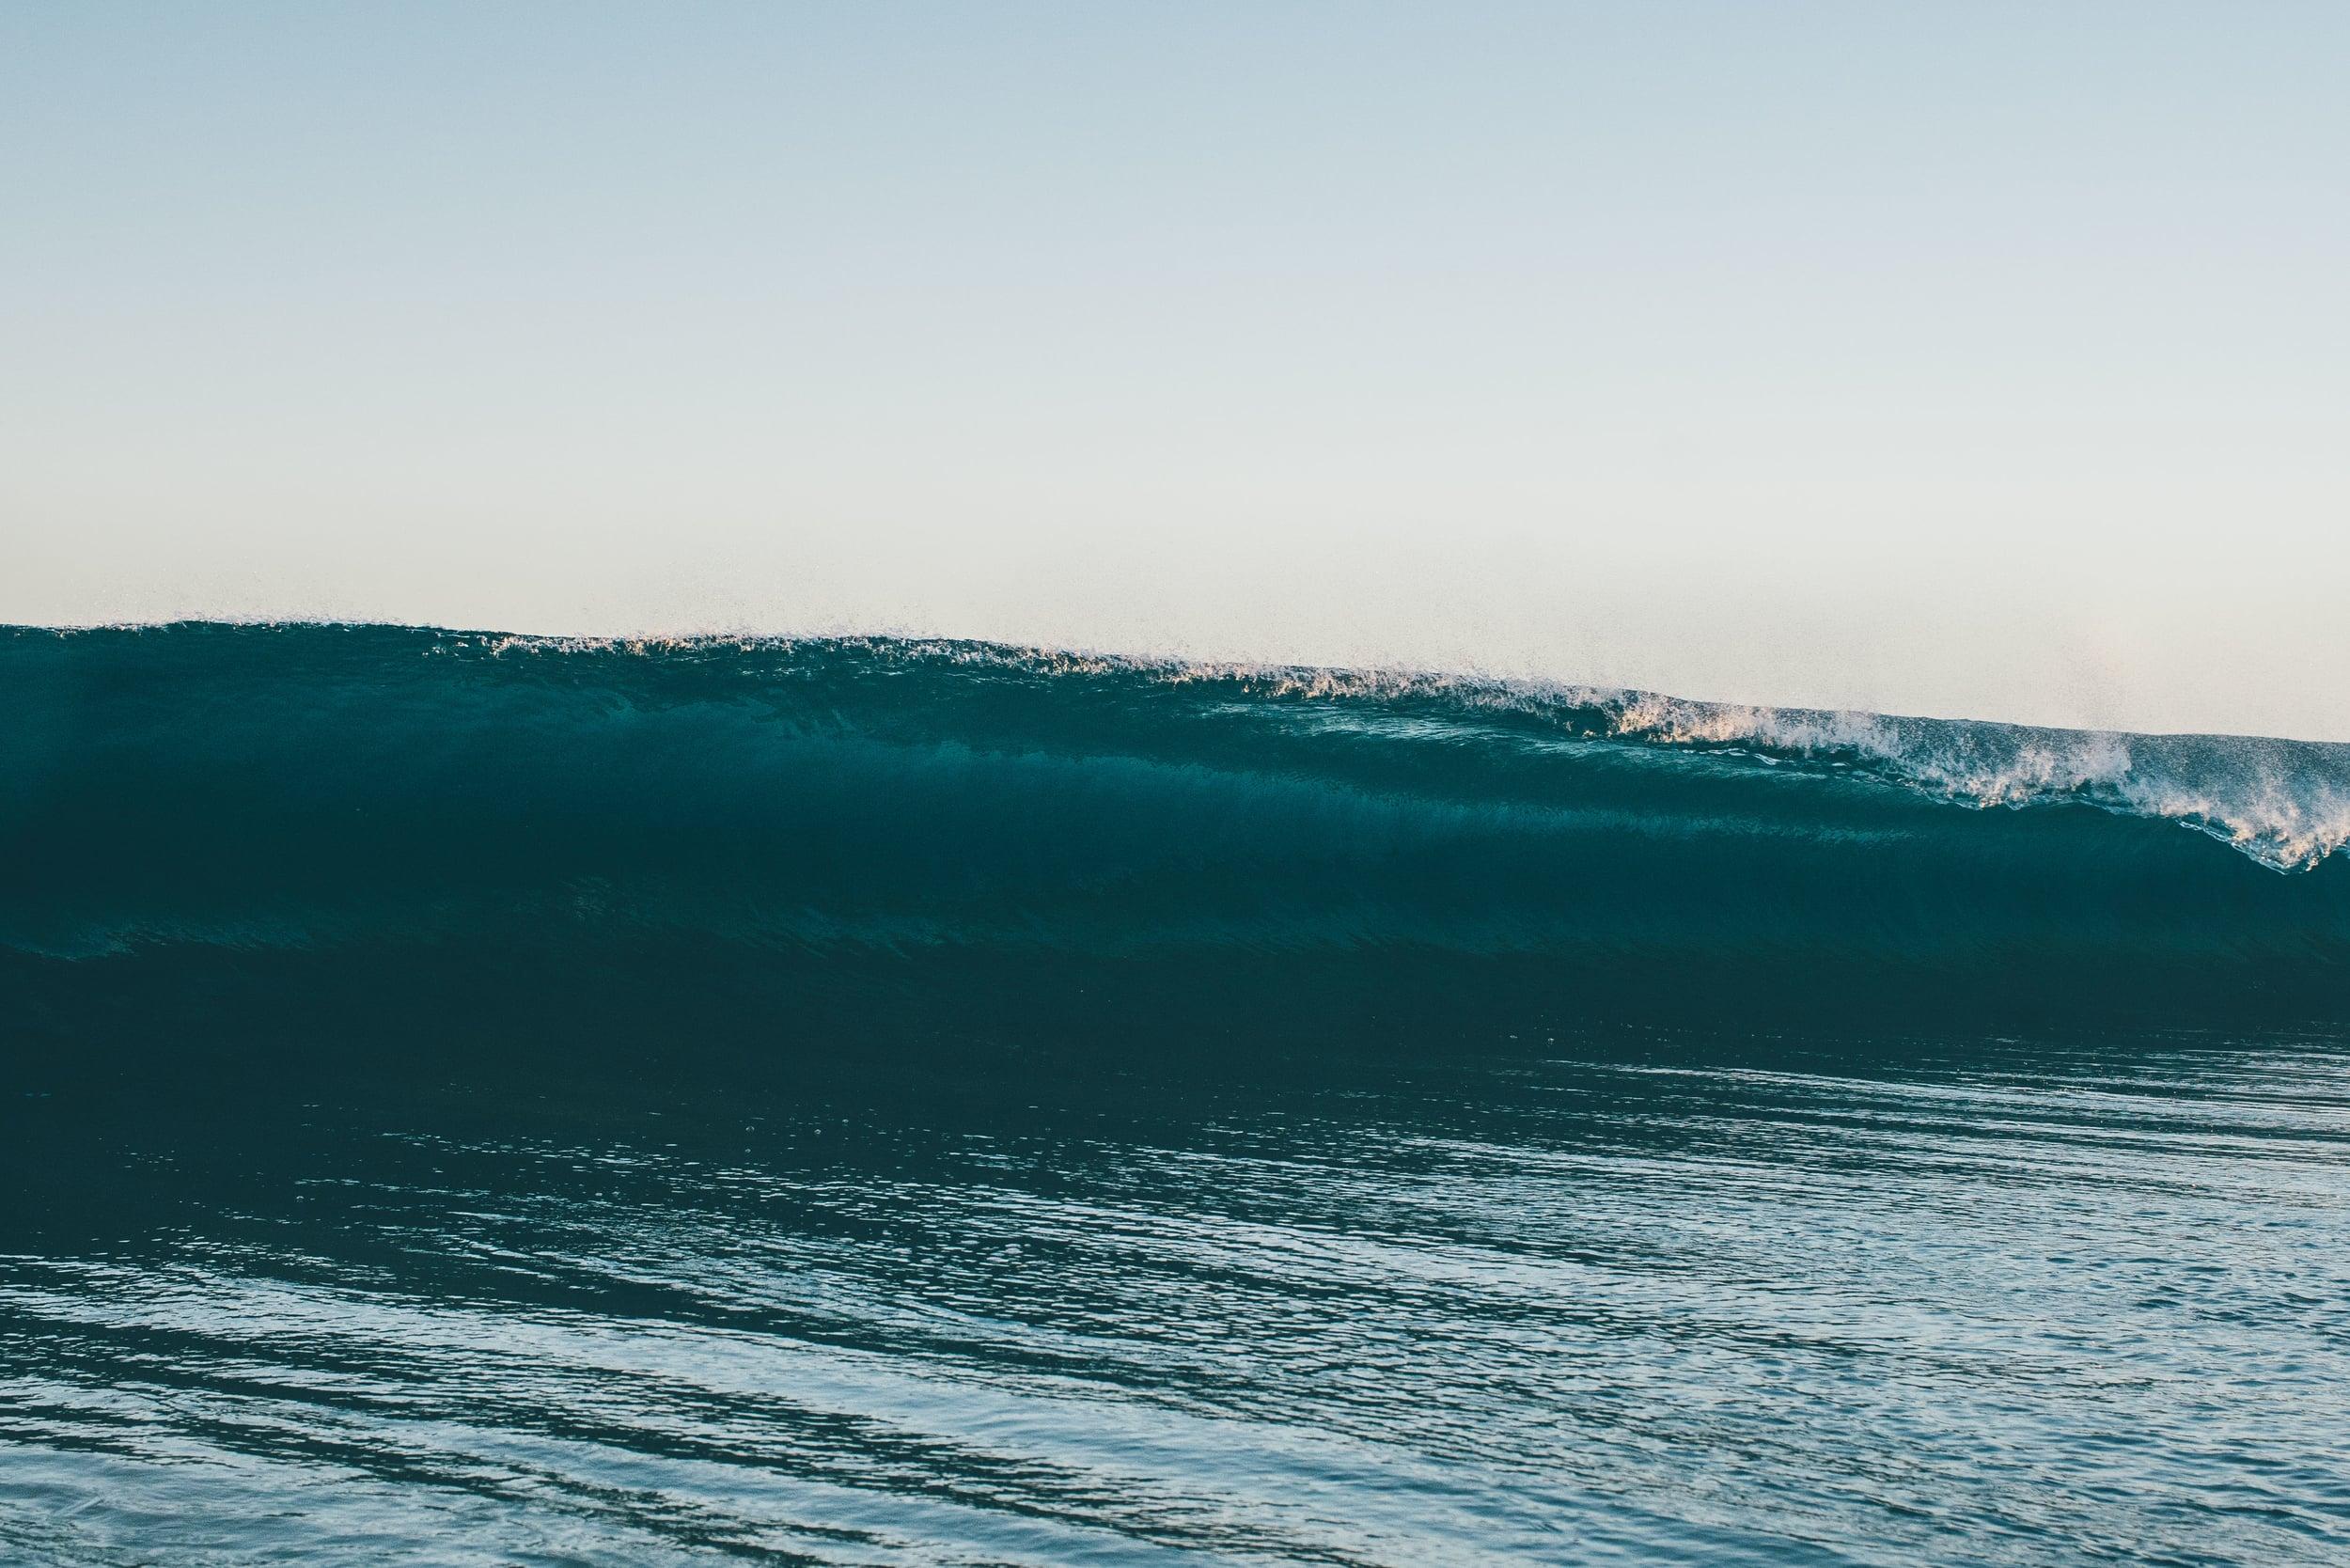 bryce-johnson-photography-kauai-hawaii-surfing-a7rii-aquatech-water-ocean-15.jpg